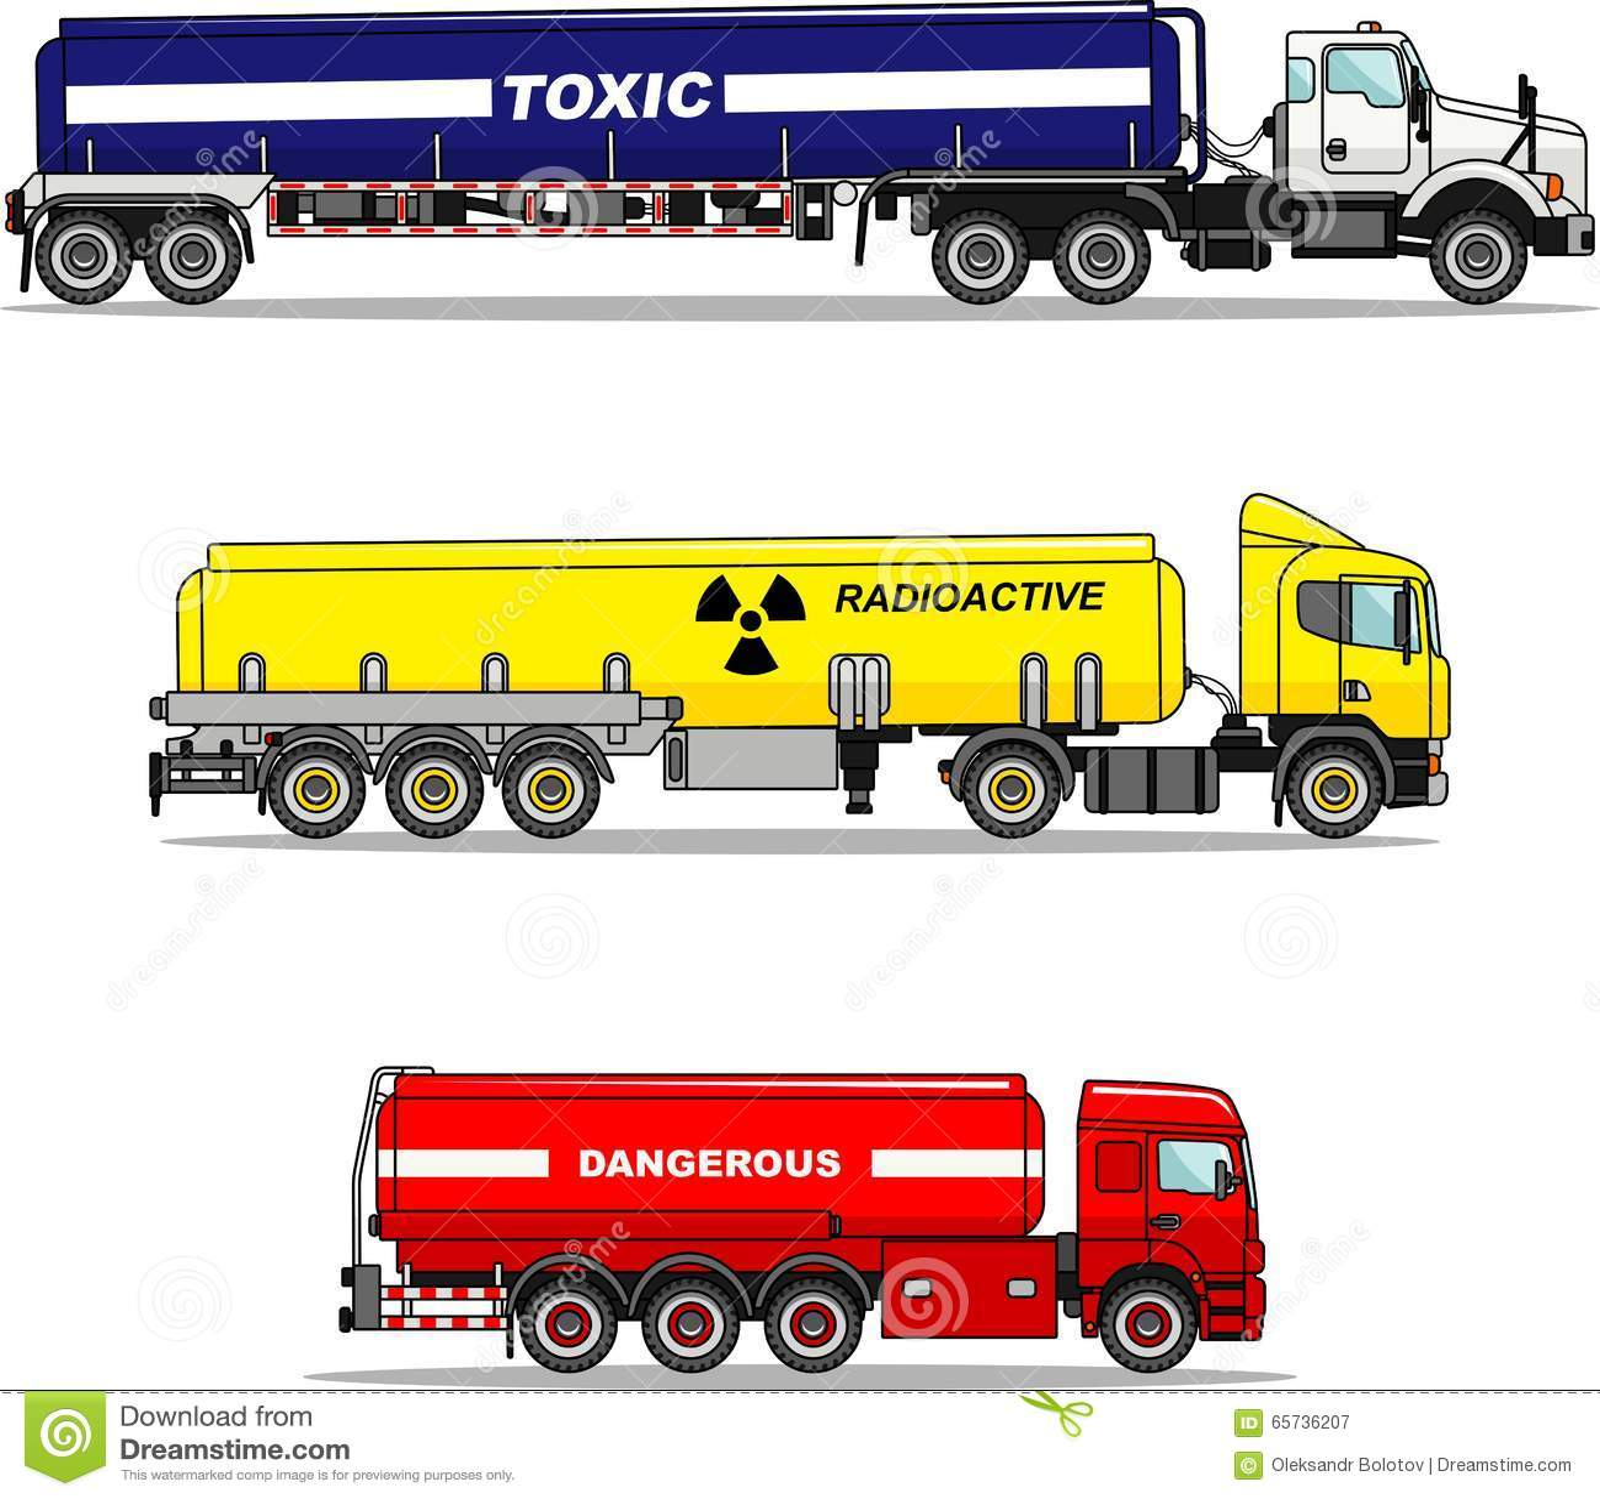 Set of cistern trucks carrying chemical, radioactive, toxic, hazardous substances isolated on white background in flat